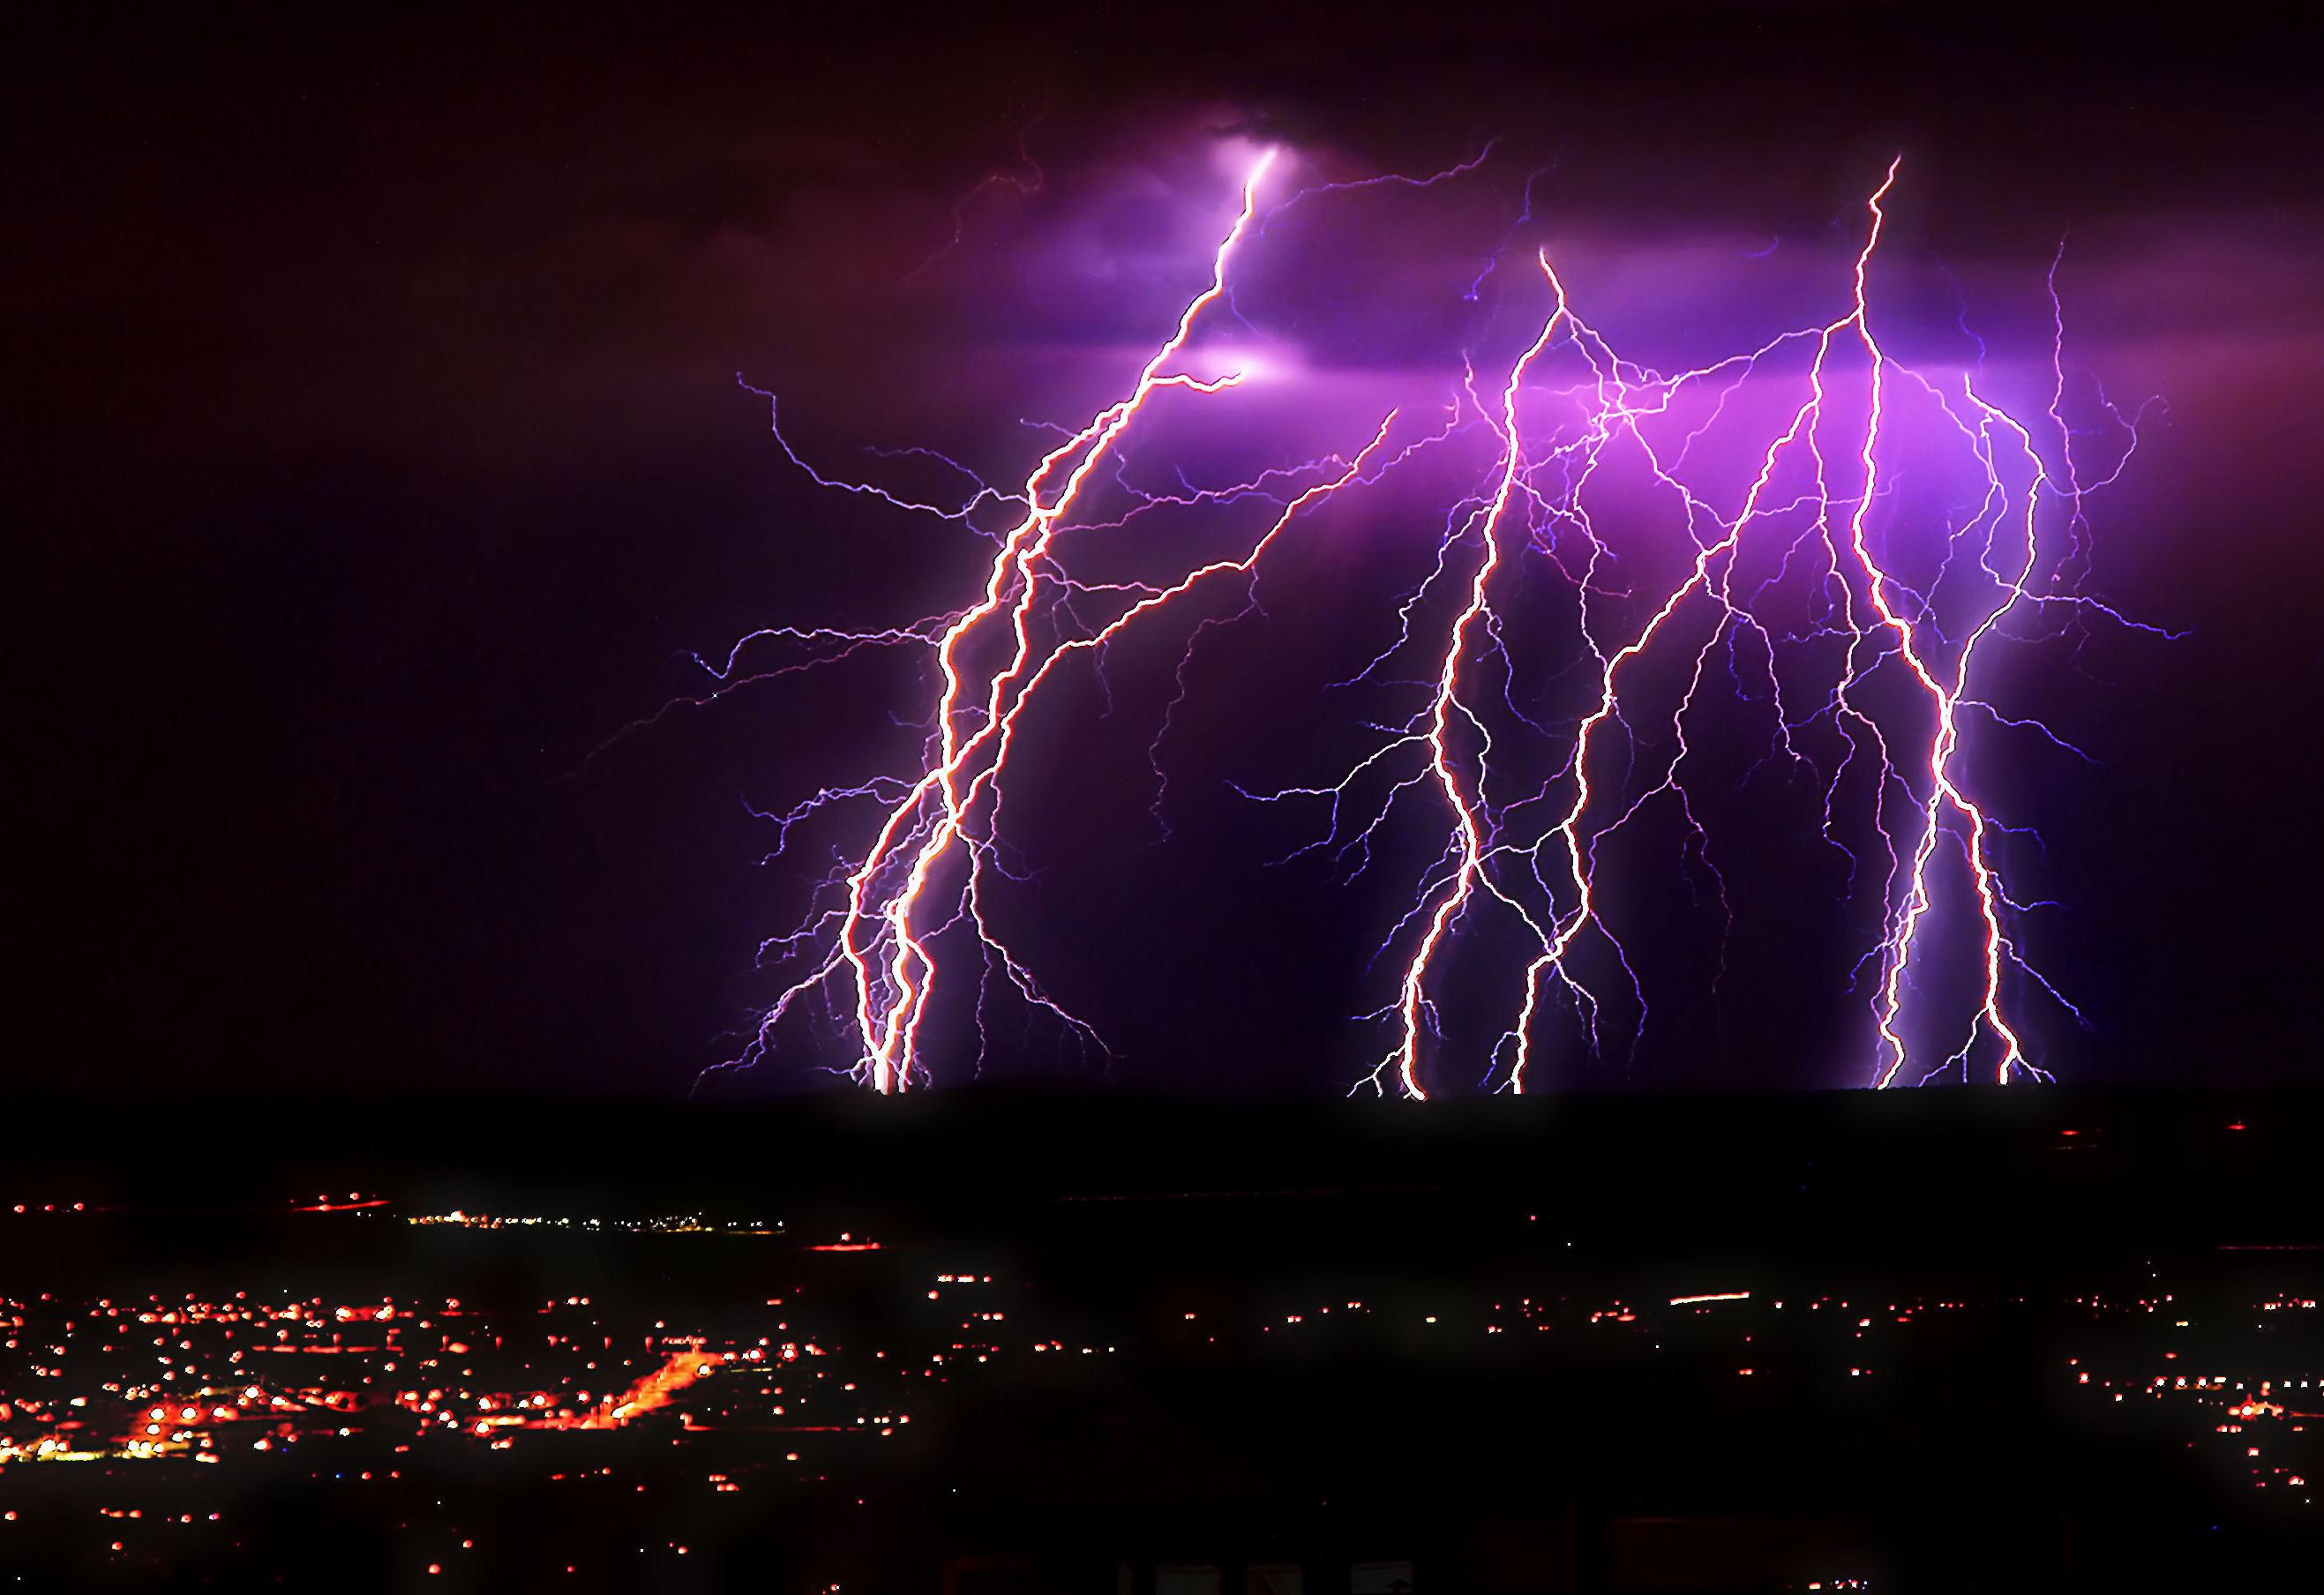 Impressive Lightning Storms for your Desktop Wallpaper Thomas Craig 2634x1808